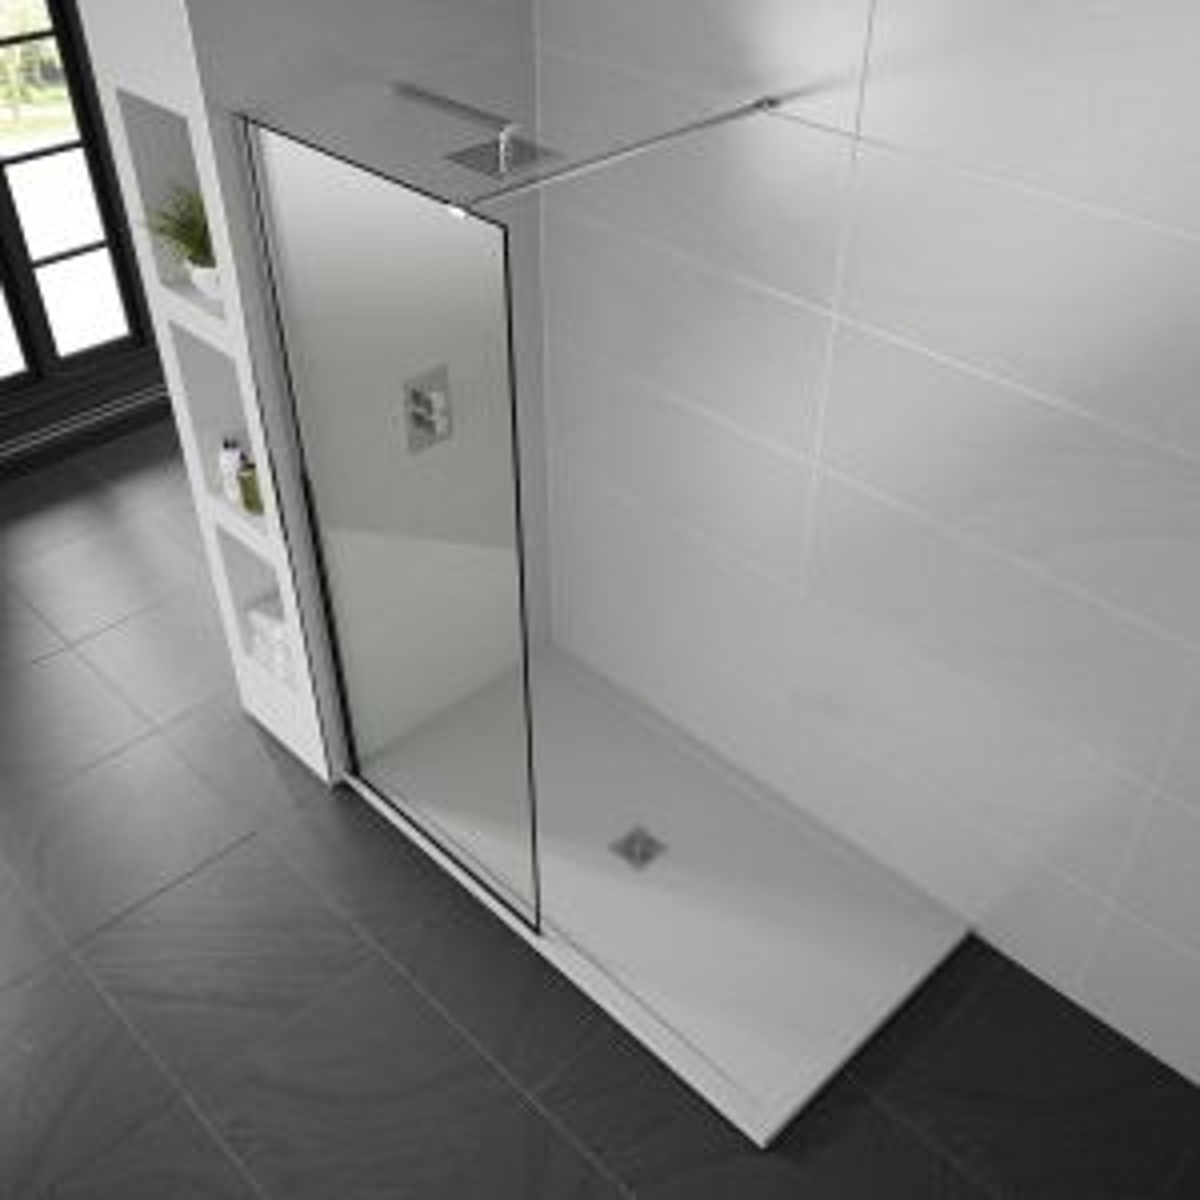 Aquadart Grey Slate Shower Tray 1200 x 700 Lifestyle